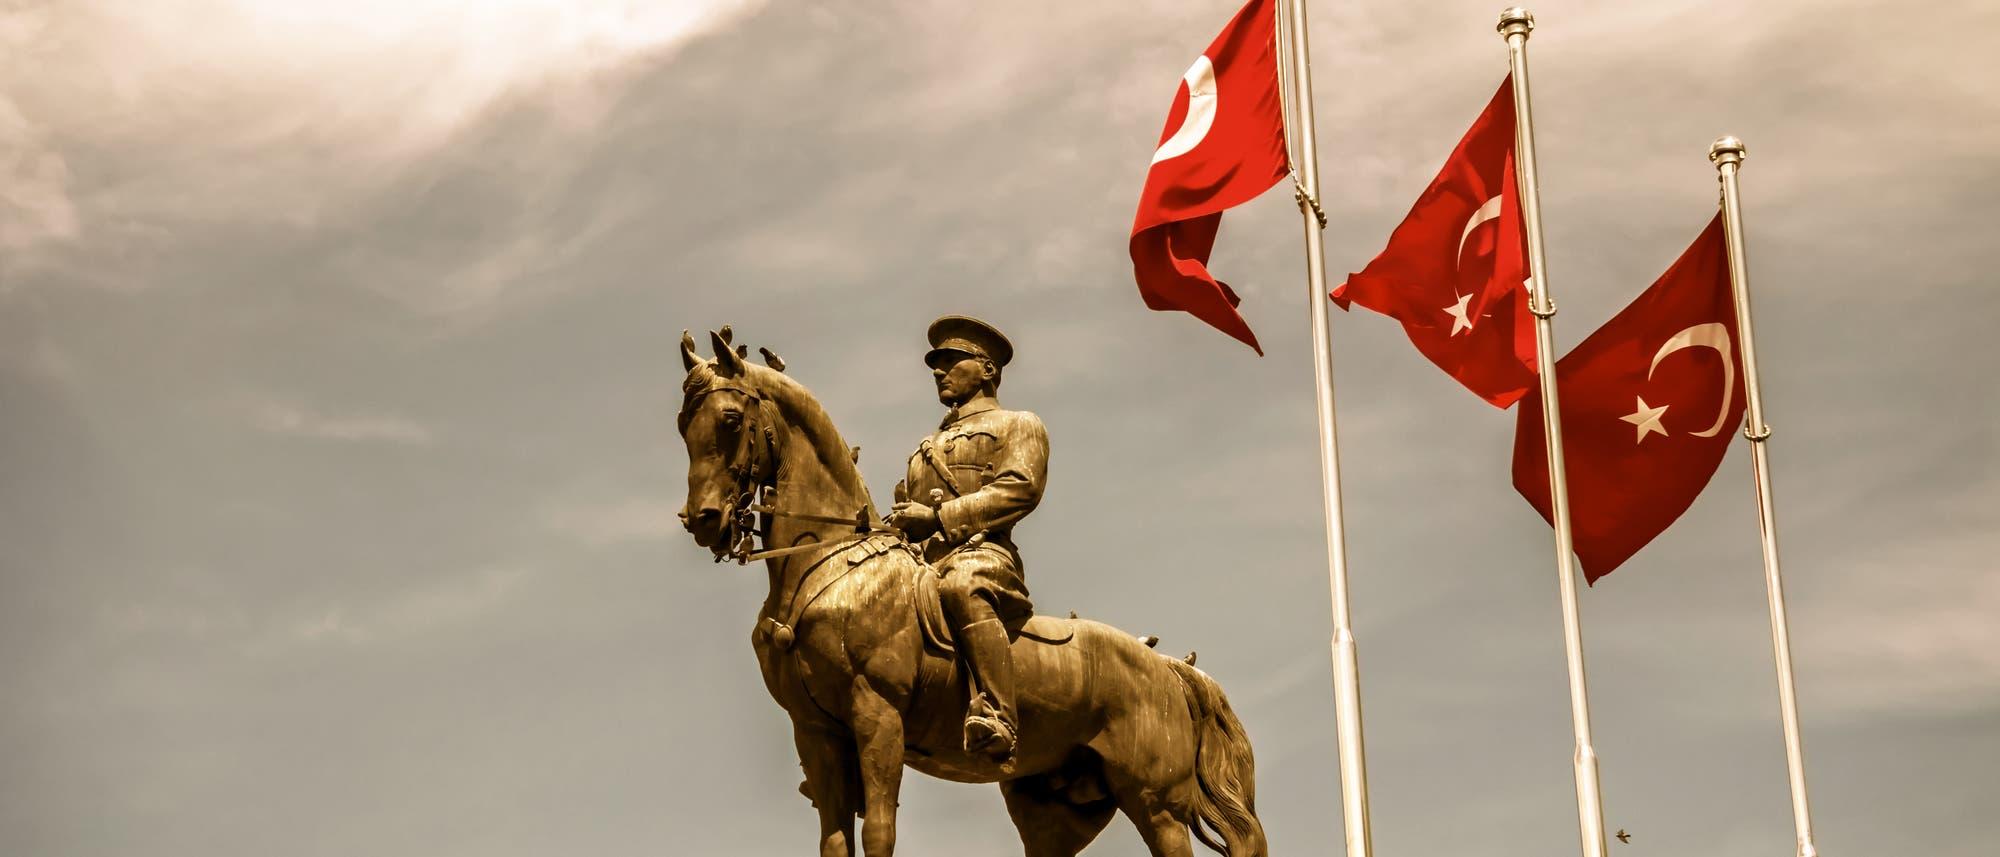 Statue von Mustafa Kemal Atatürk in Ulus, Ankara